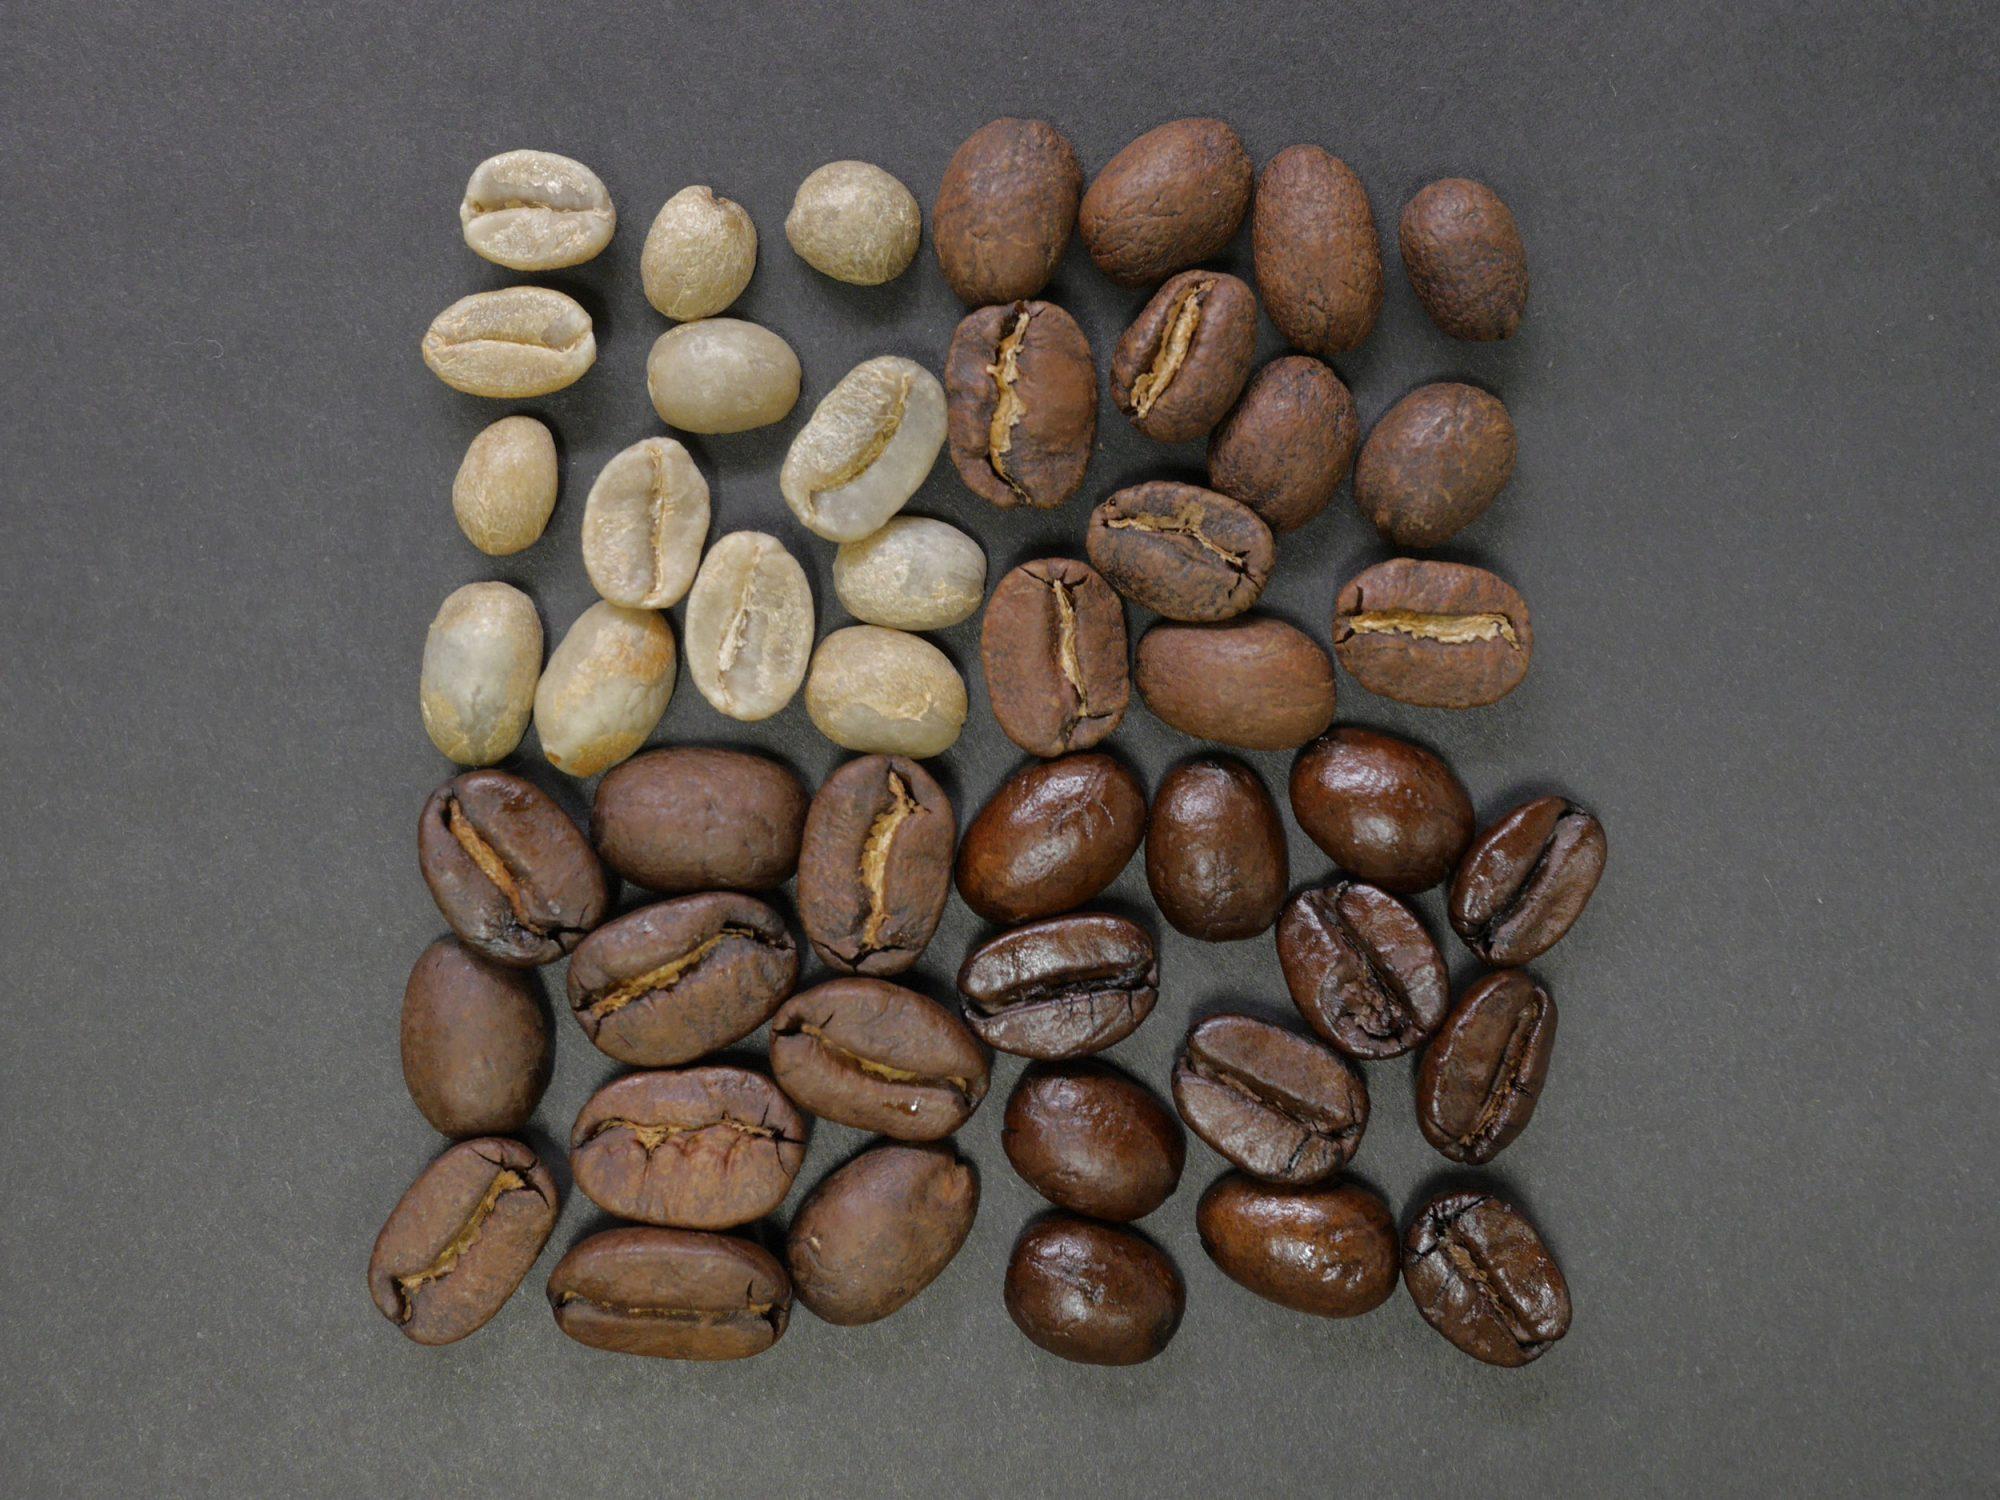 EC: Does Light or Dark Roast Coffee Have More Caffeine?